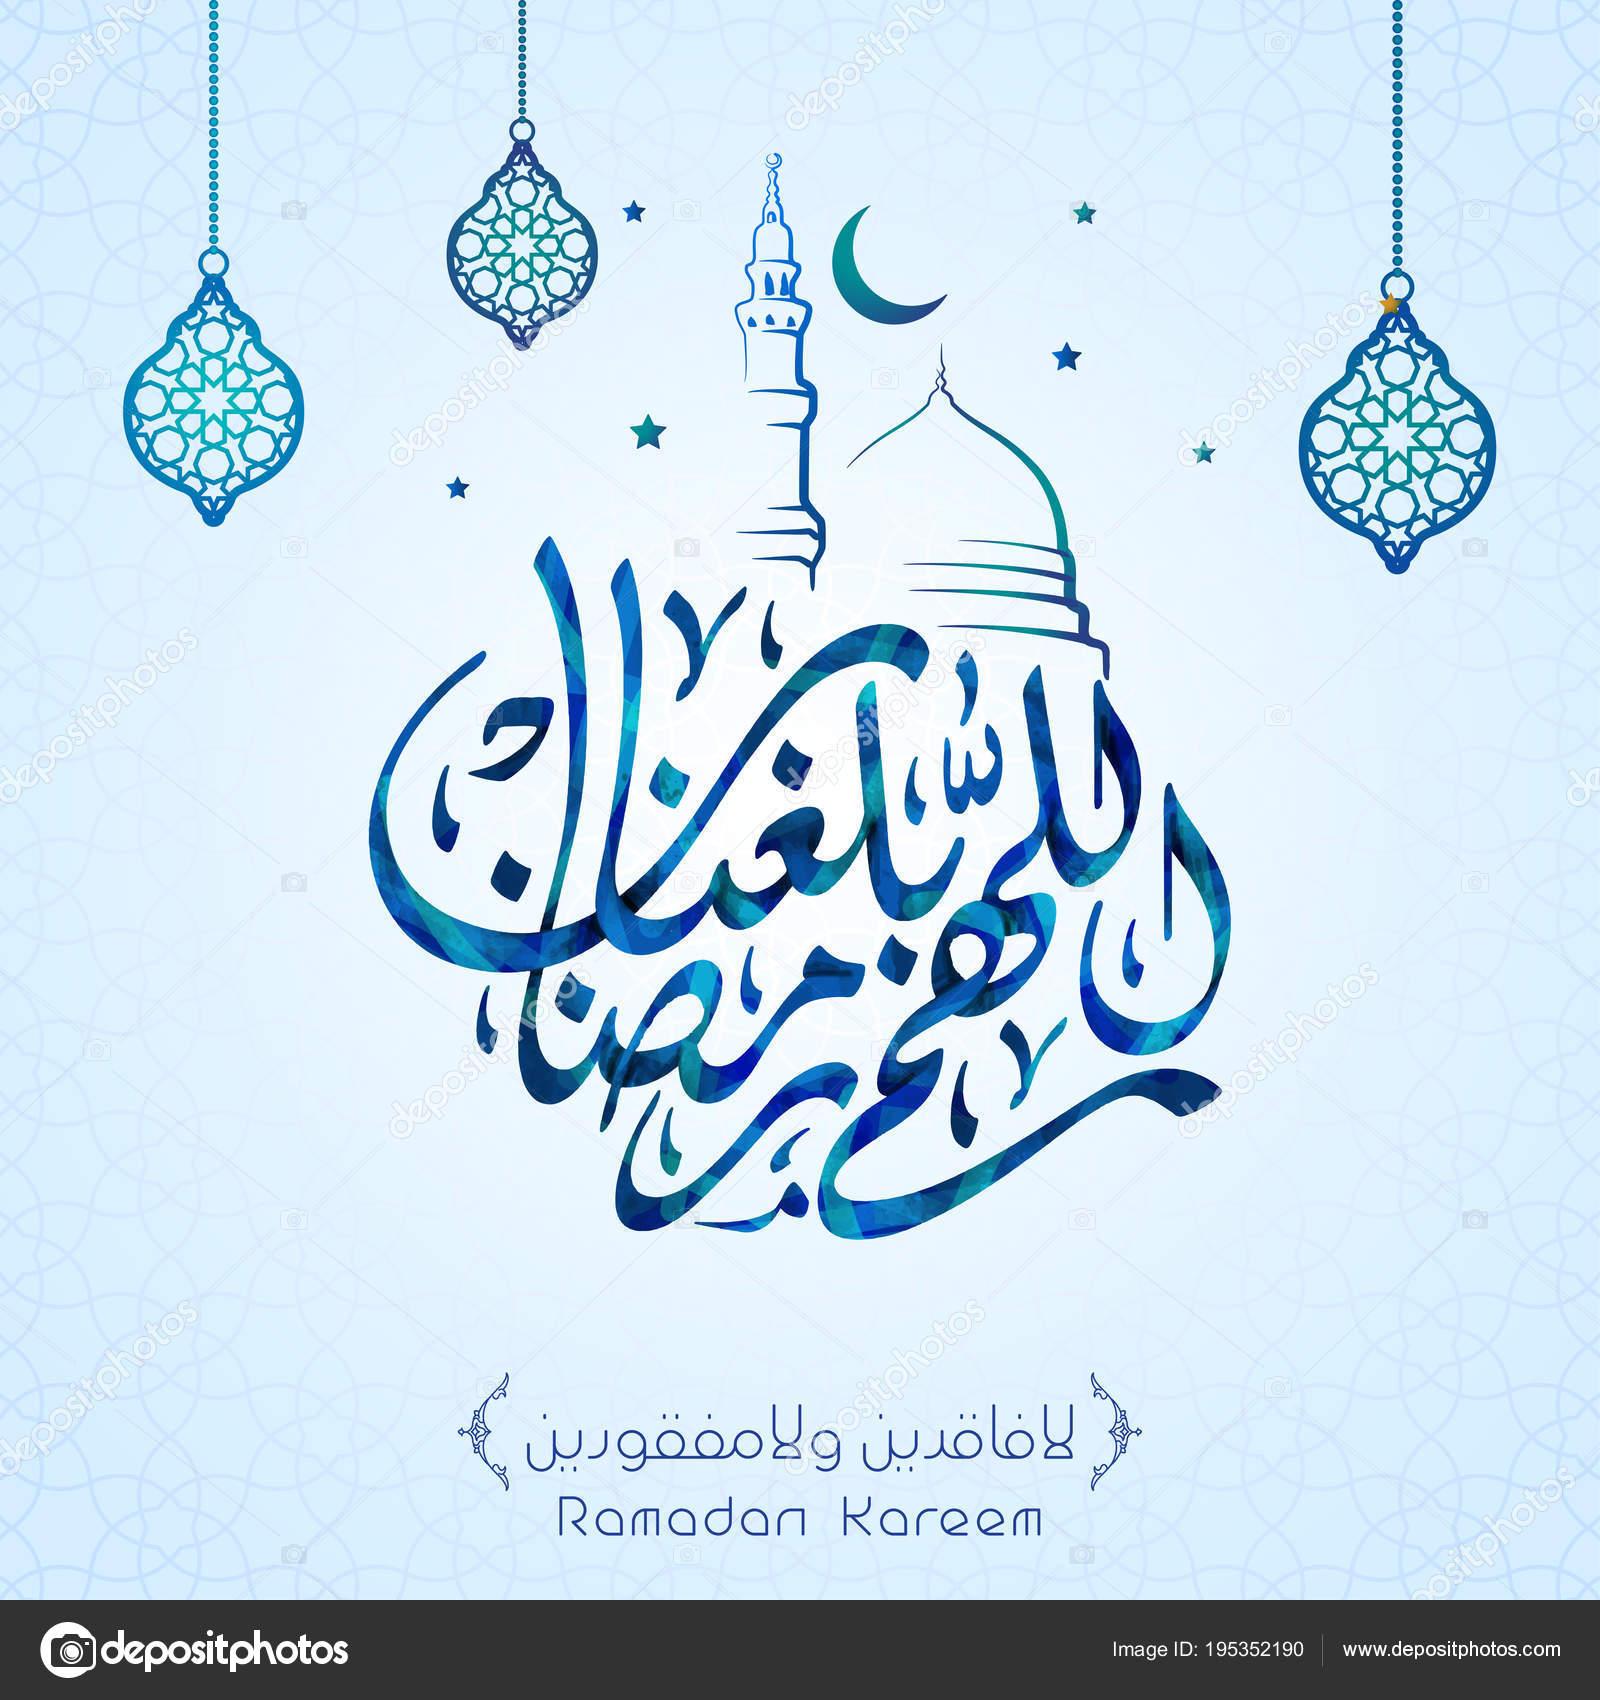 Ramadan kareem welcome greeting arabic calligraphy stock vector ramadan kareem welcome greeting arabic calligraphy stock vector m4hsunfo